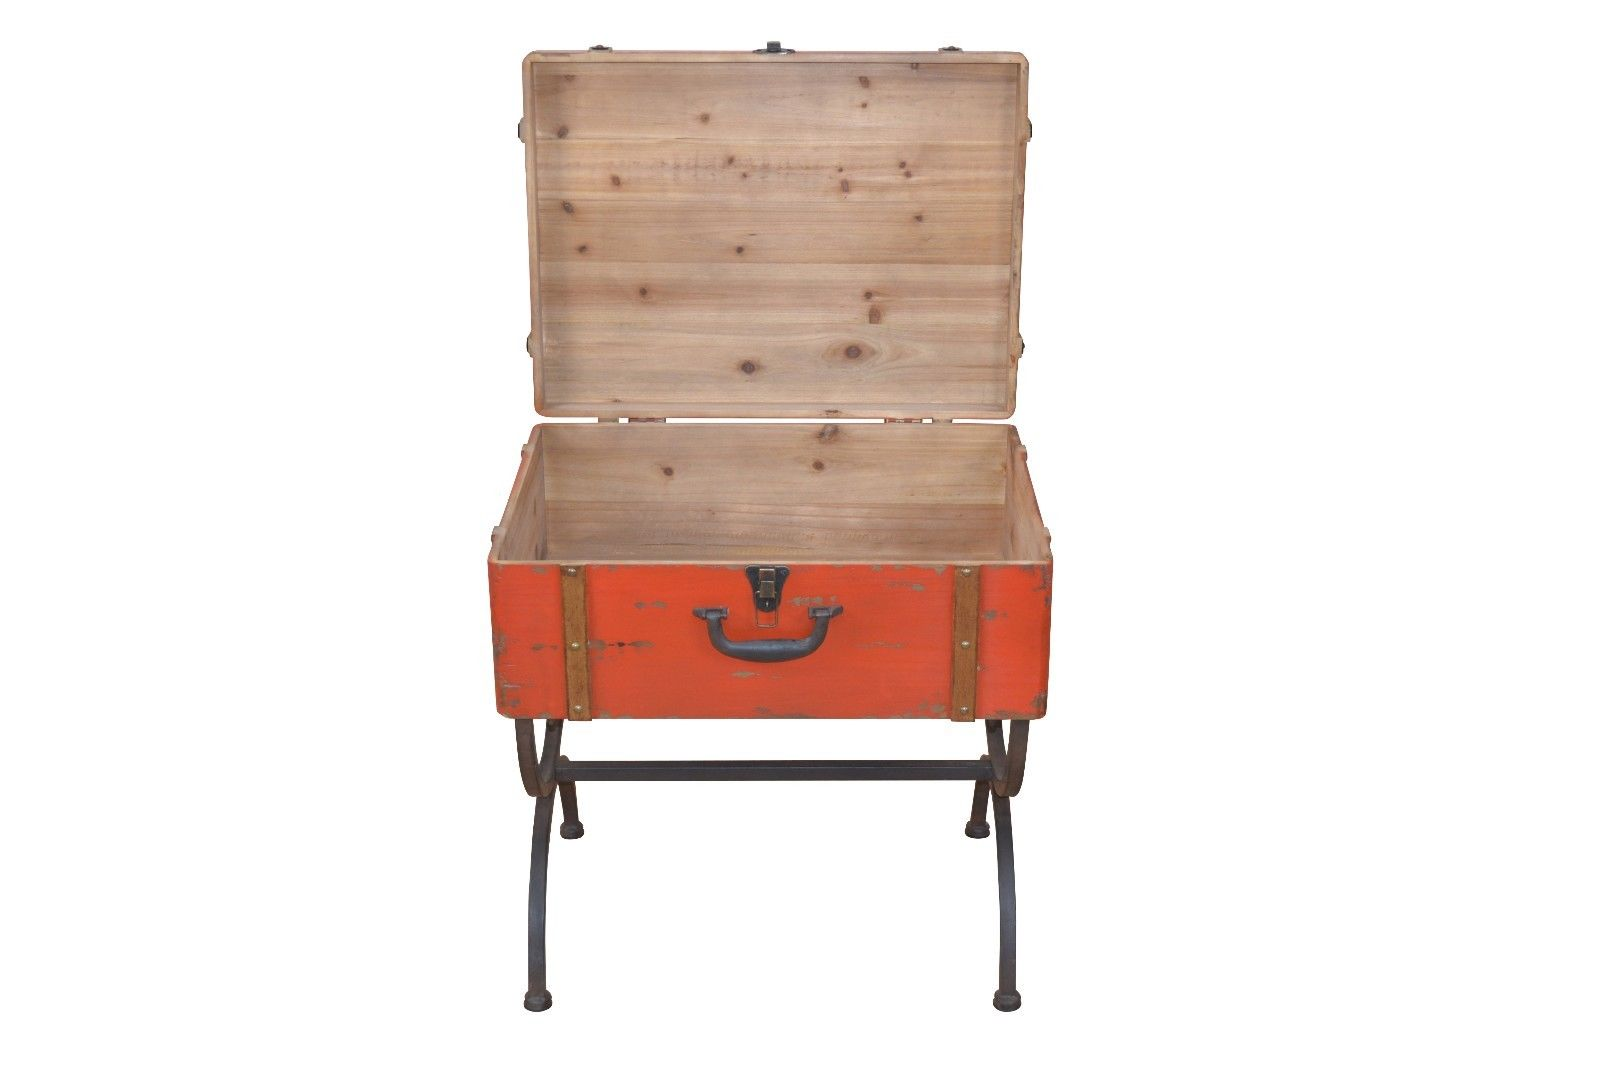 koffer als deko koffer als deko folia zum bemalen koffer. Black Bedroom Furniture Sets. Home Design Ideas